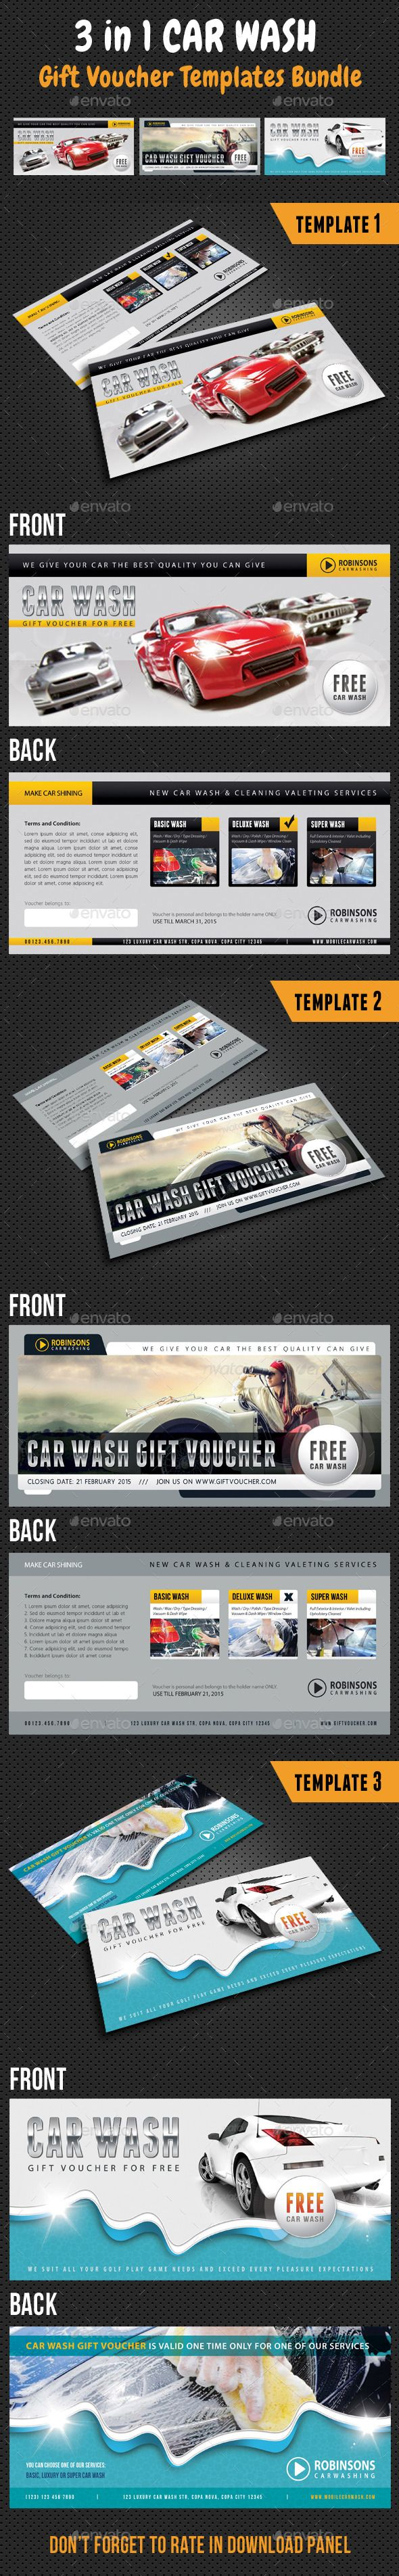 23 best Gift voucher images on Pinterest | Gift cards, Gift ...